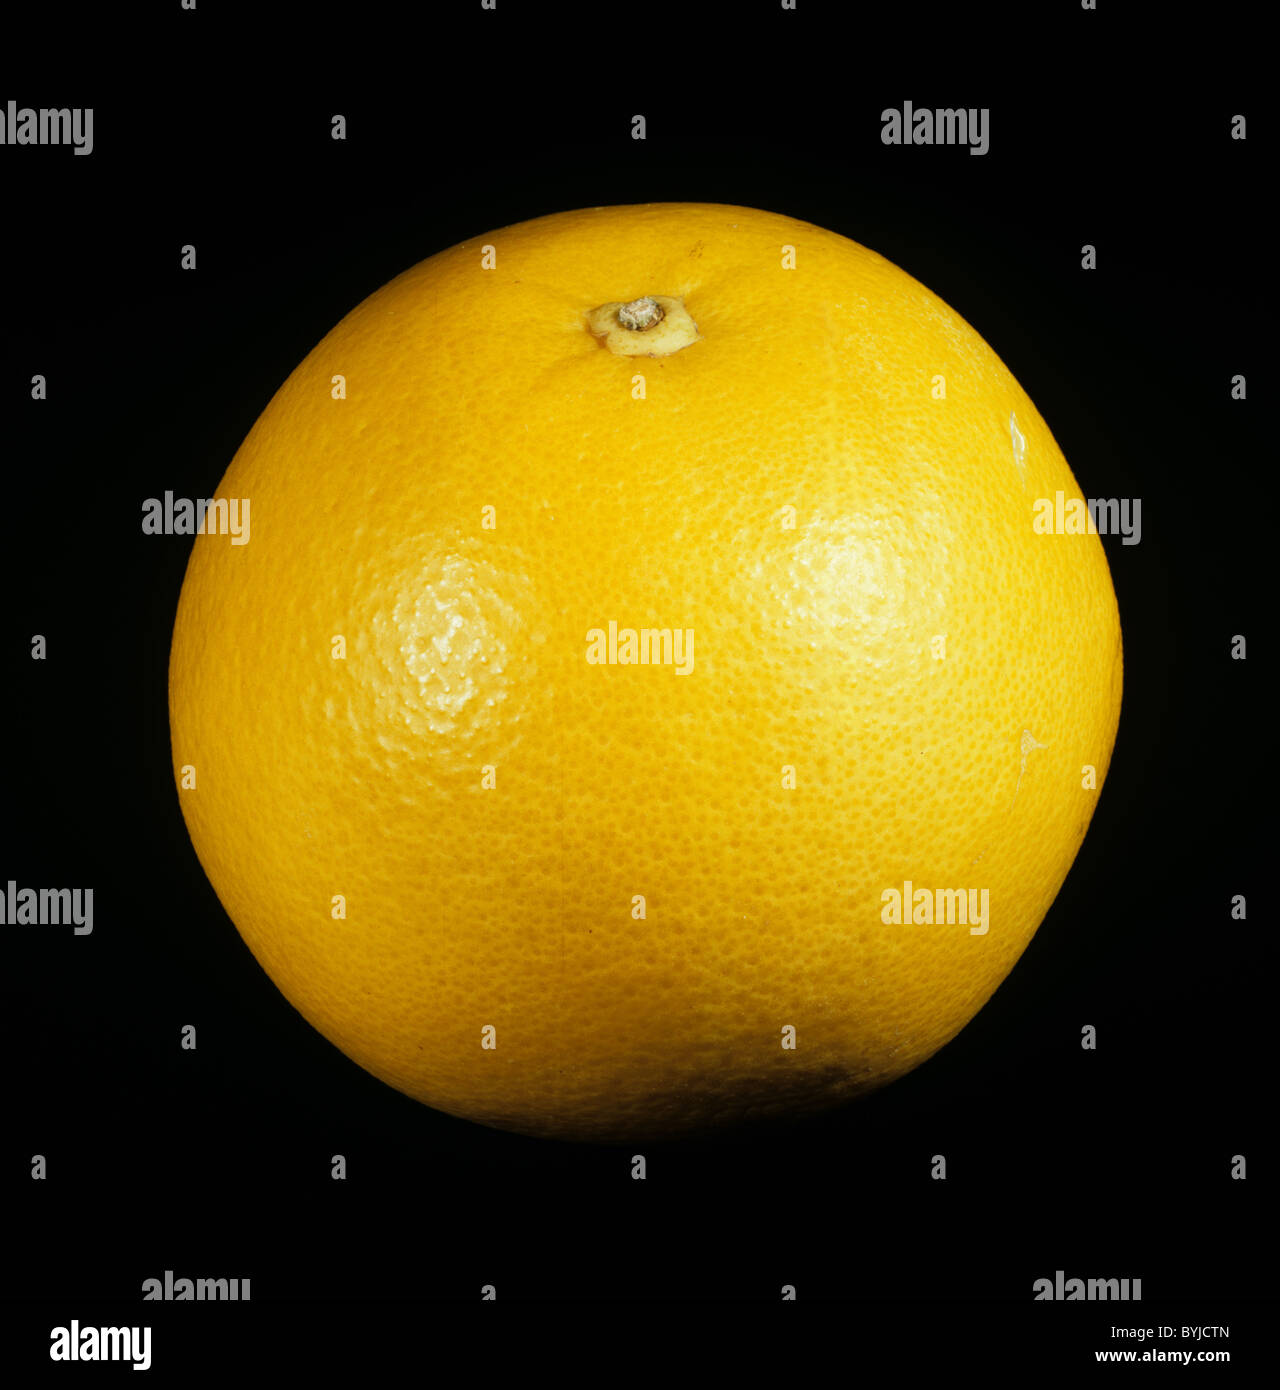 Whole citrus fruit grapefruit variety Marsh Seedless - Stock Image